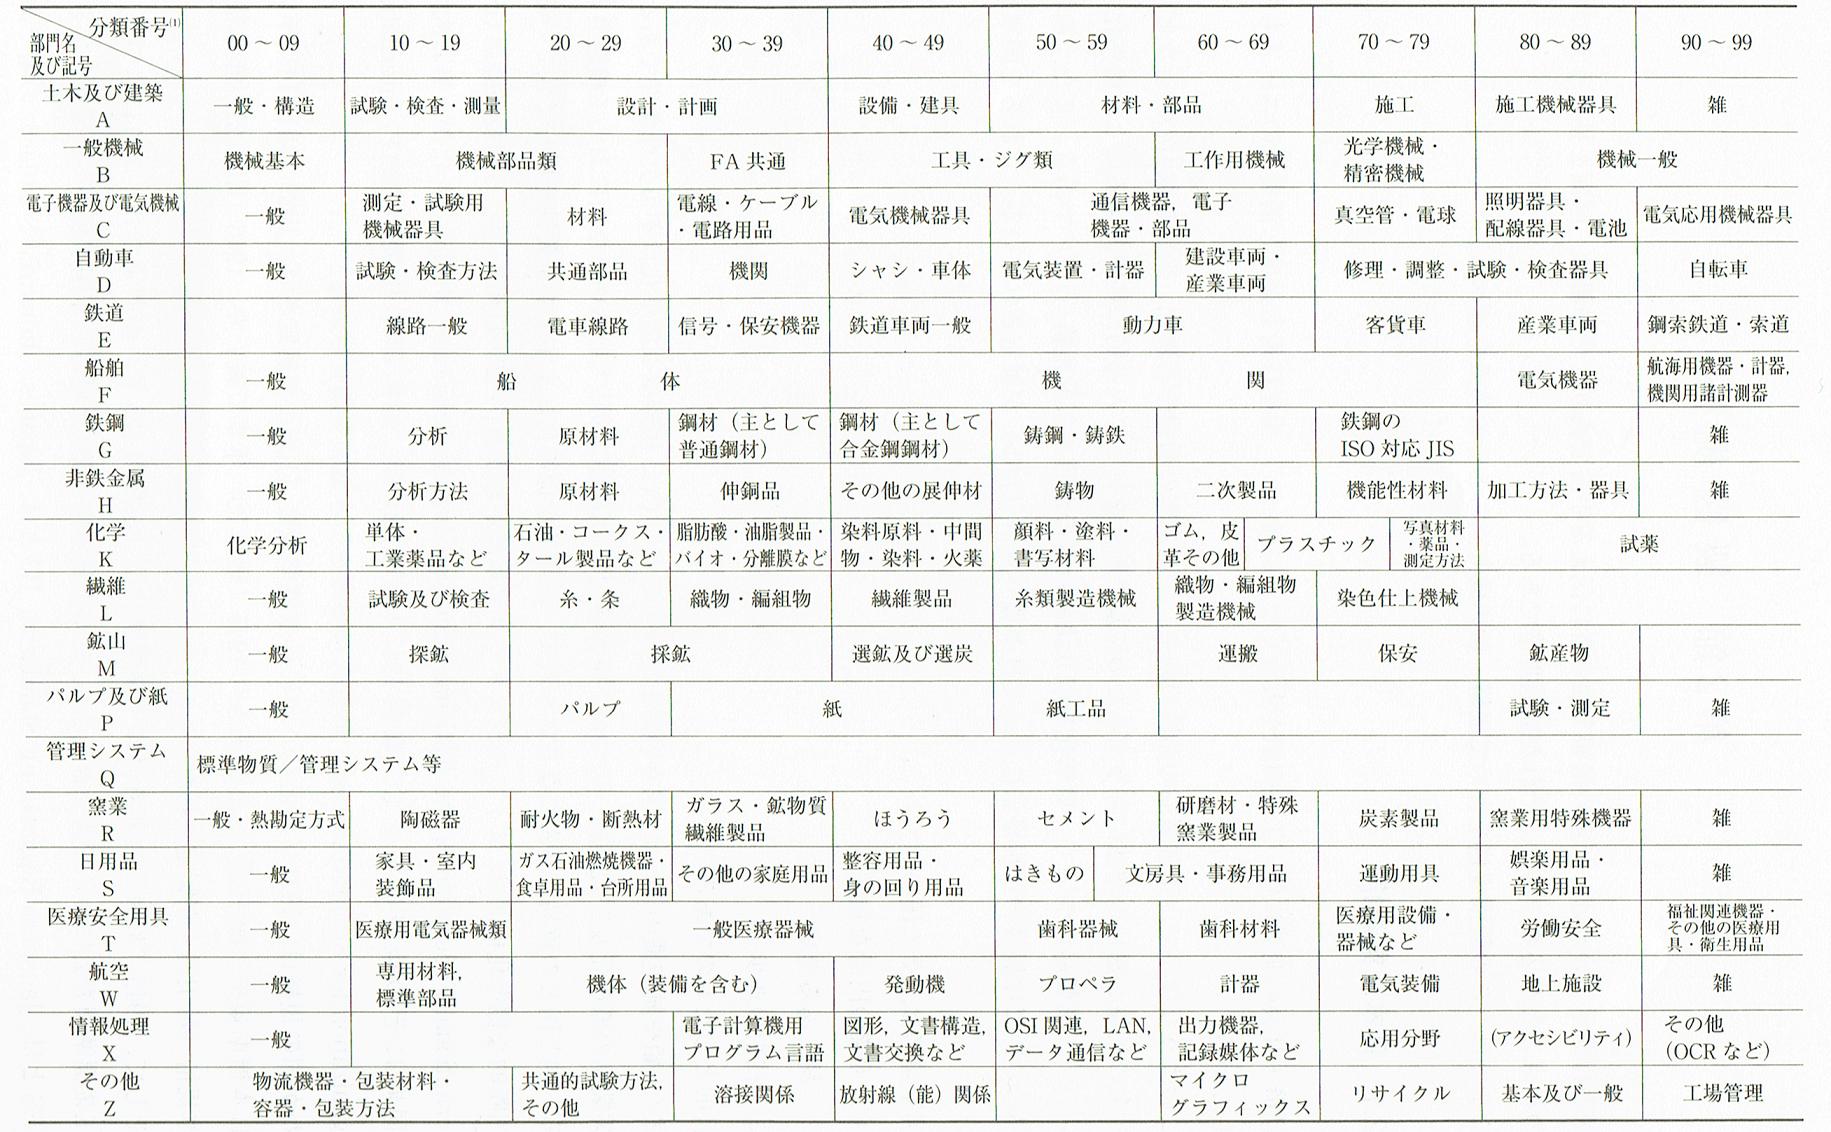 JISの部門記号と分類番号